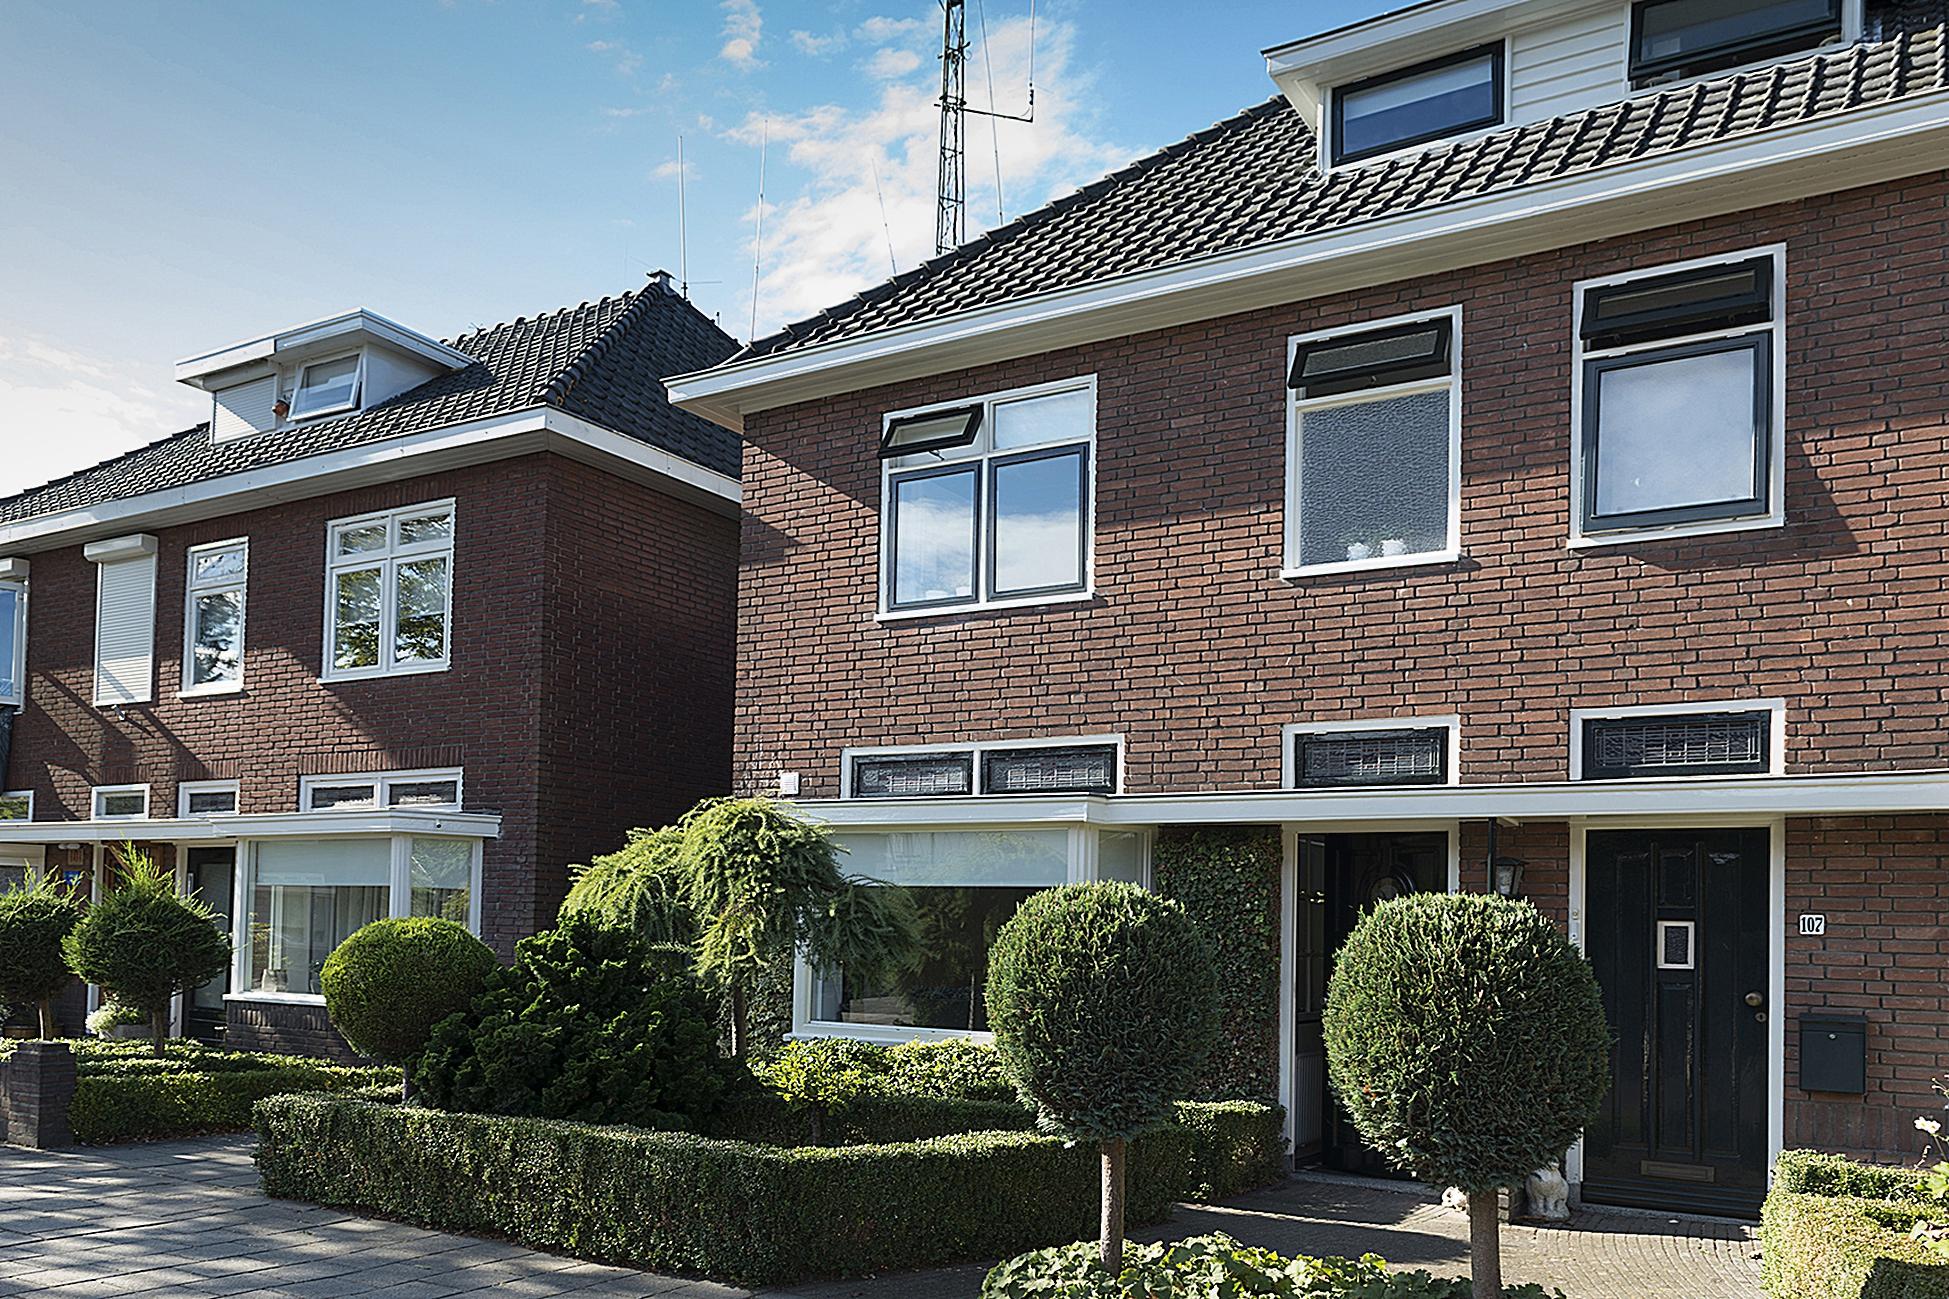 Dahliastraat 105 Enschede